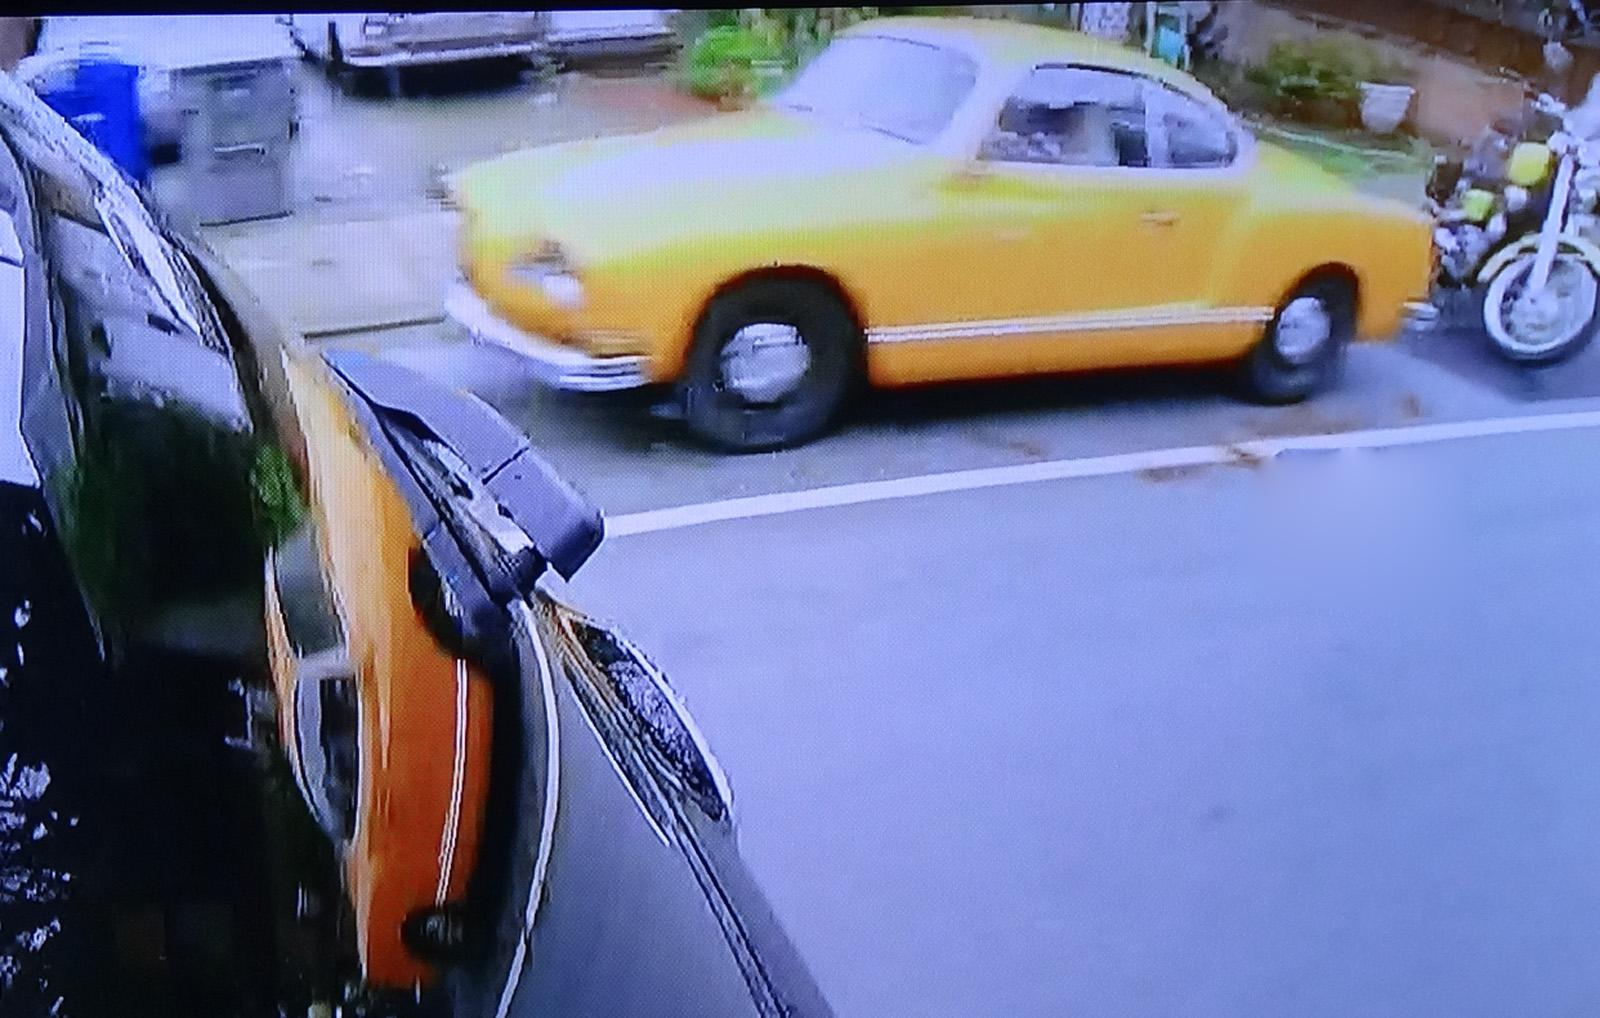 Karmann Ghia seen on Wheeler Dealers